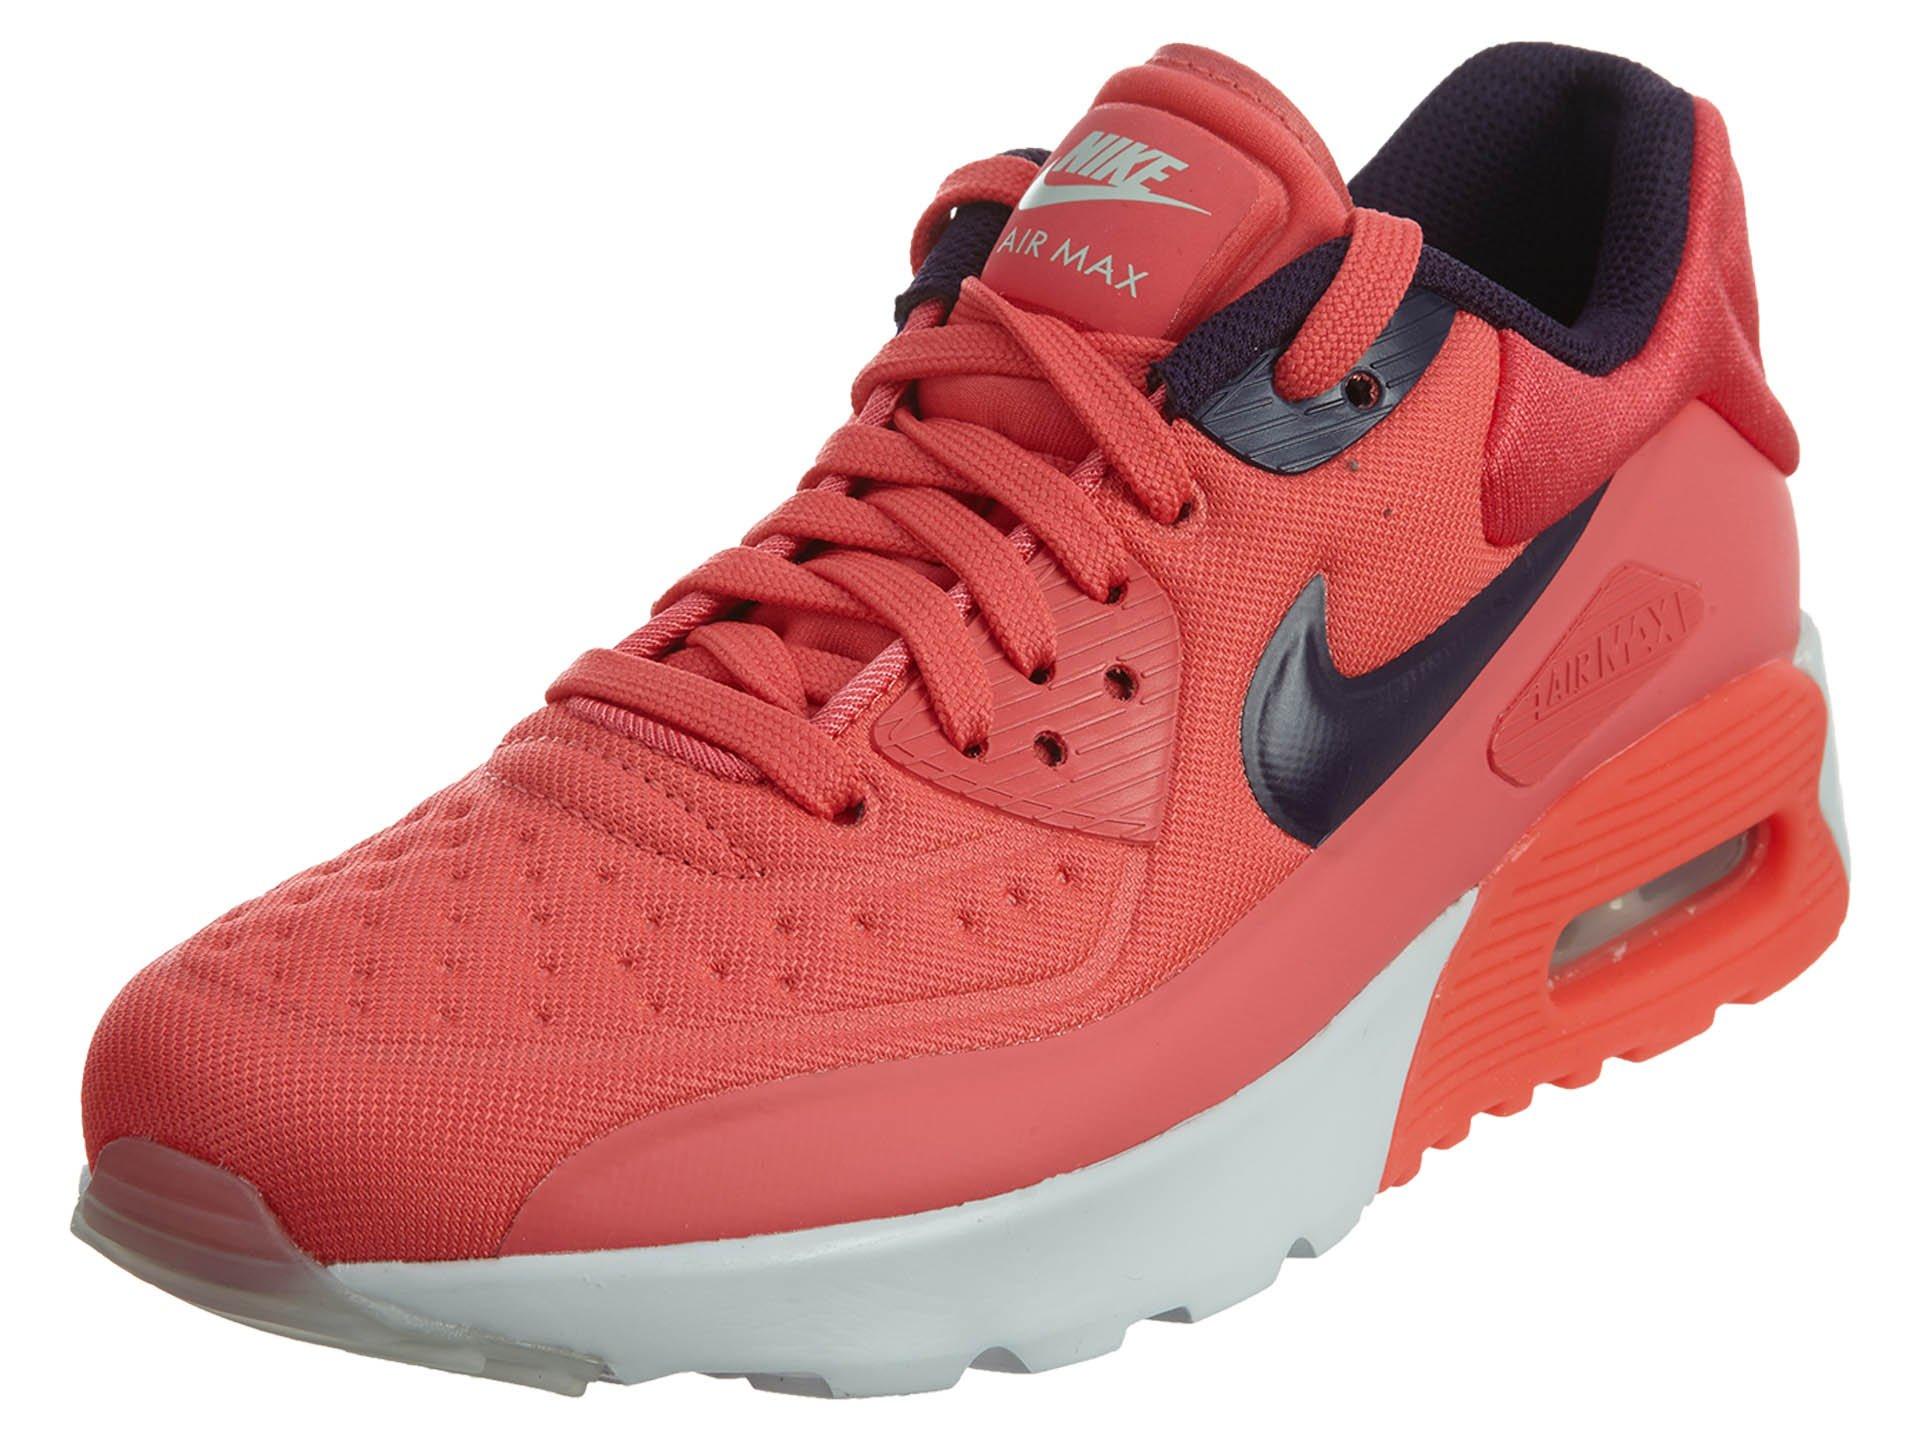 buy popular dbcb0 64966 Galleon - Nike AIR MAX 90 ULTRA SE (GS) Girls Fashion-sneakers  844600-800 7Y - Ember Glow Purple Dynasty-pure Platinum